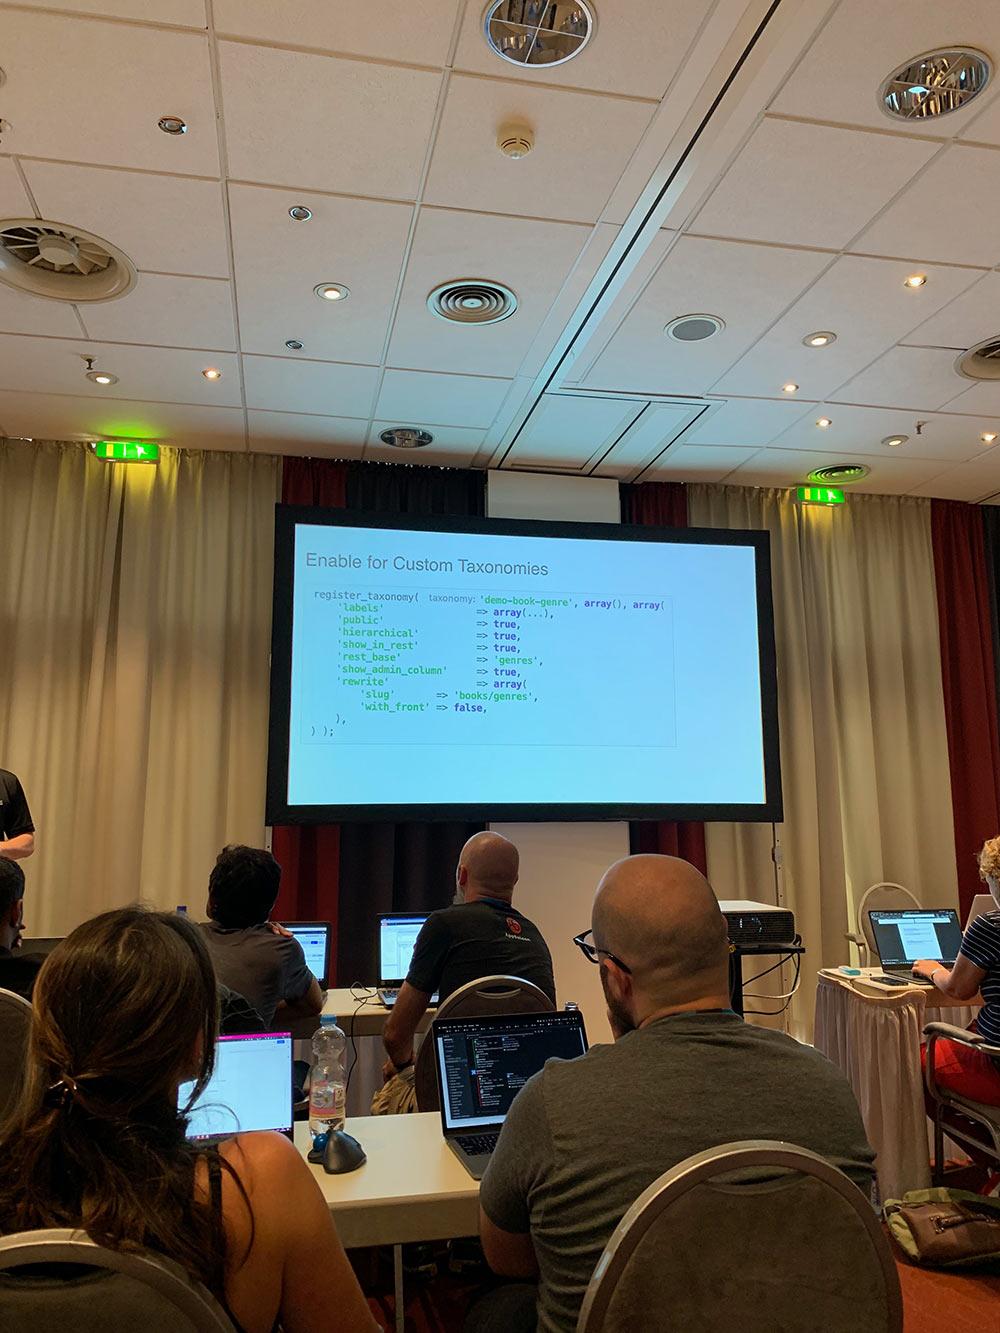 wceu 2019 day3 05 - WordCamp Europe 2019 - WordPress Konferenz – Tag 3 meines #InfluencerReisli